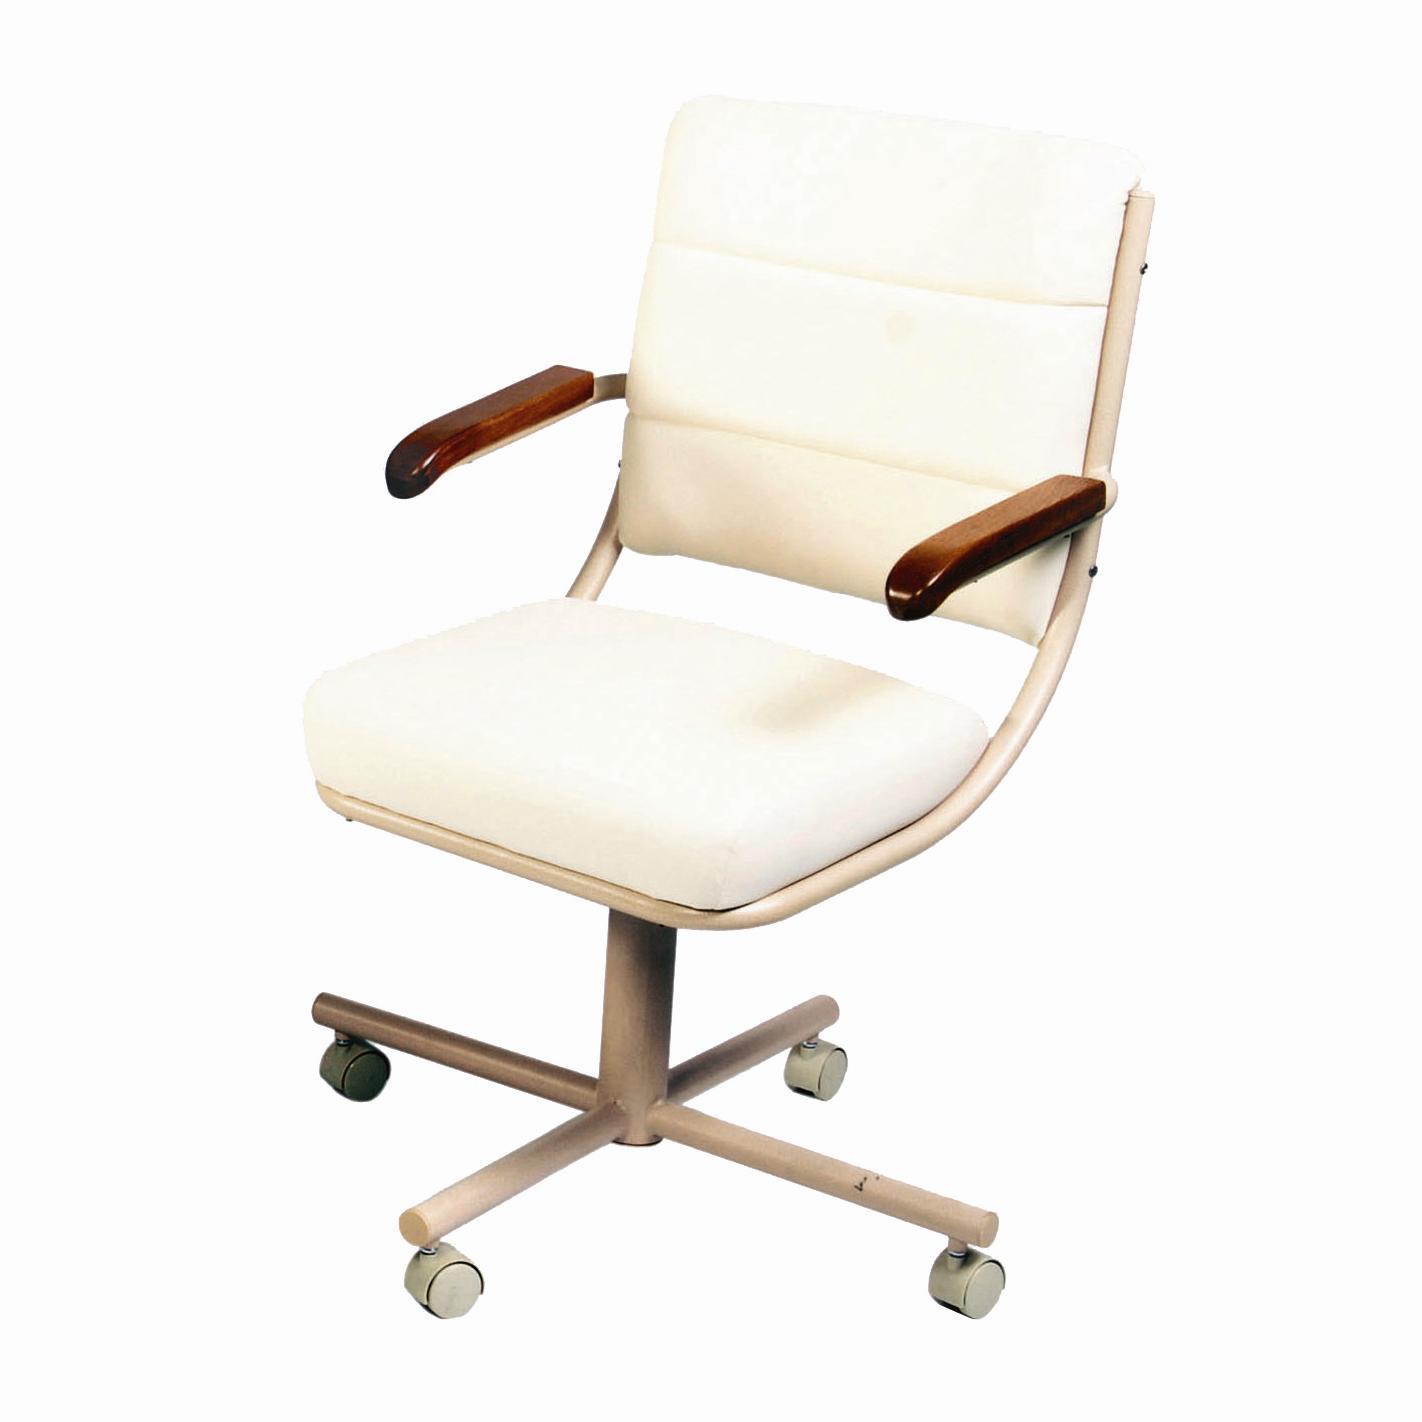 Beau Douglas Casual Living Caster Dinnette Upholstered Caster Dining Arm Chair